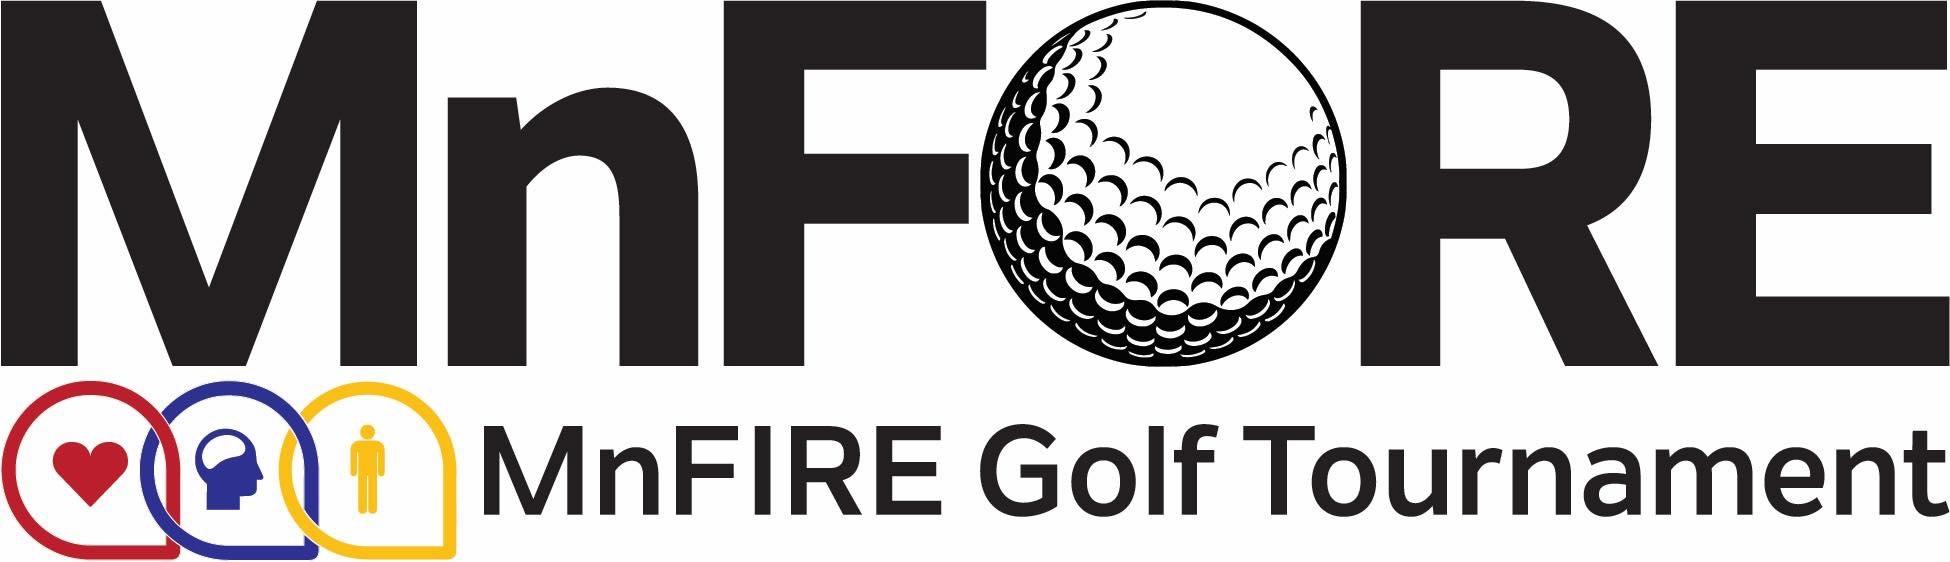 3rd Annual MnFORE Golf Tournament logo